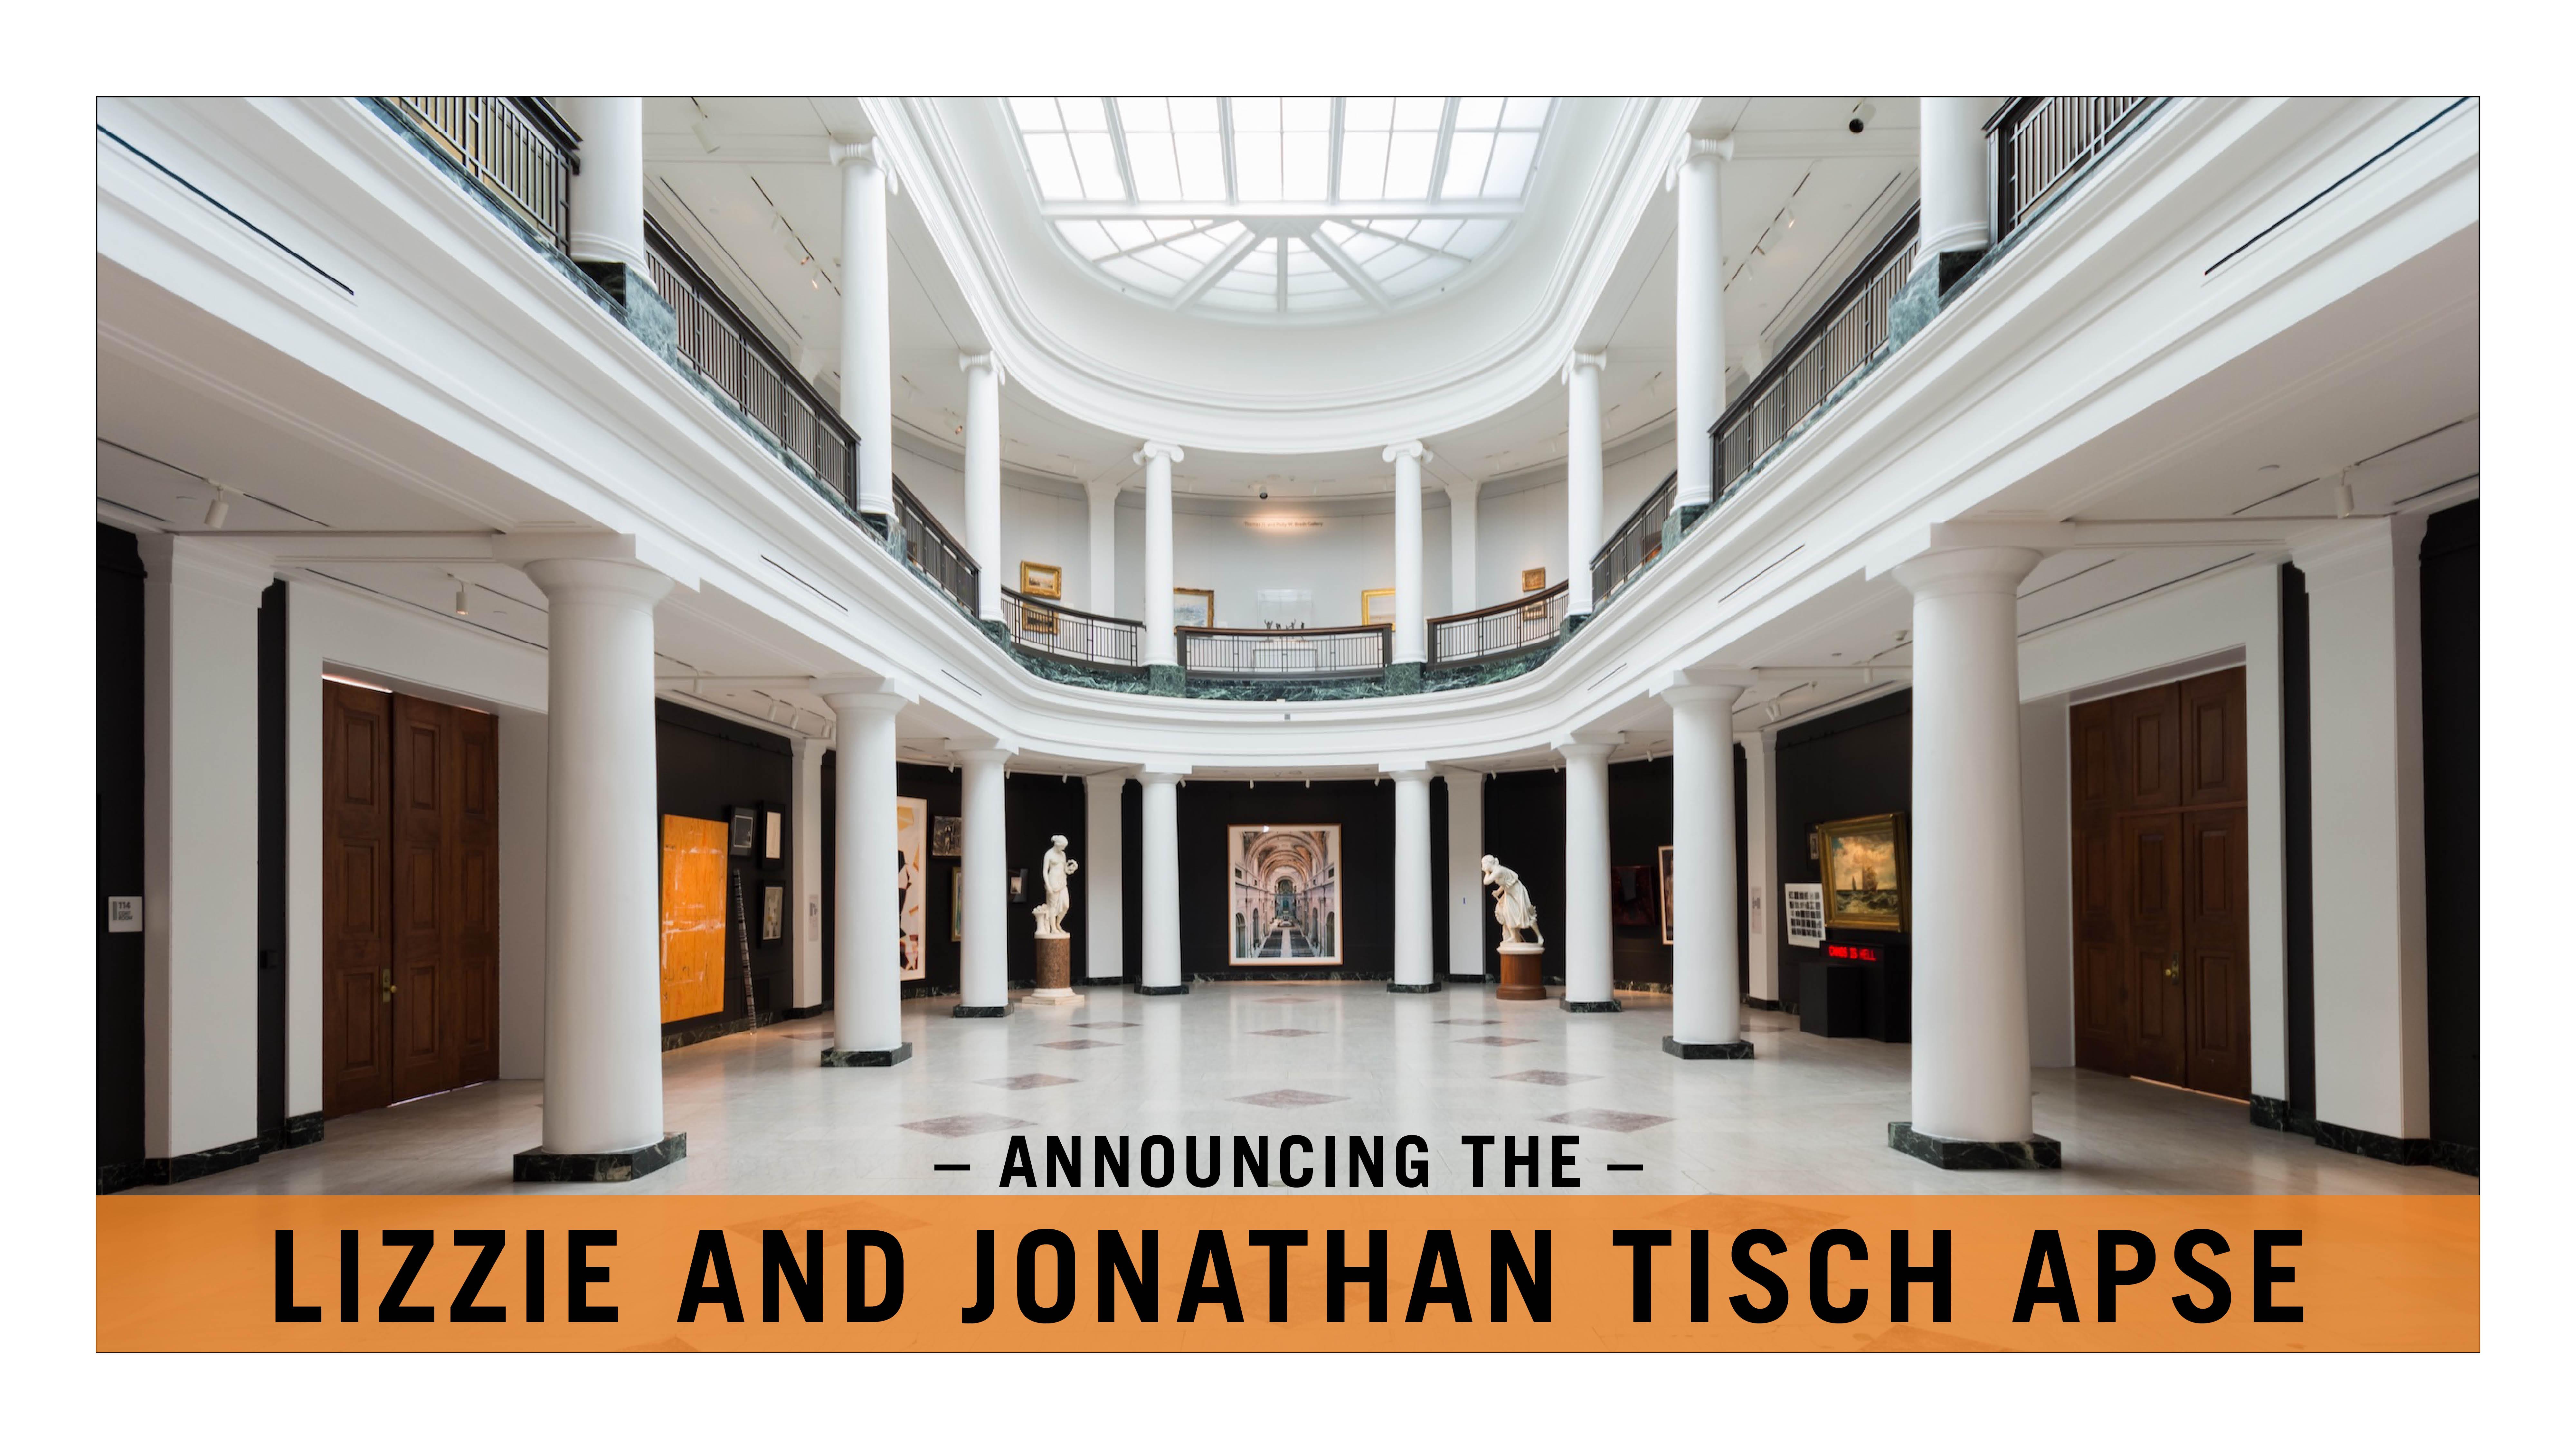 Announcing the Lizzie an Jonathan Tisch Apse